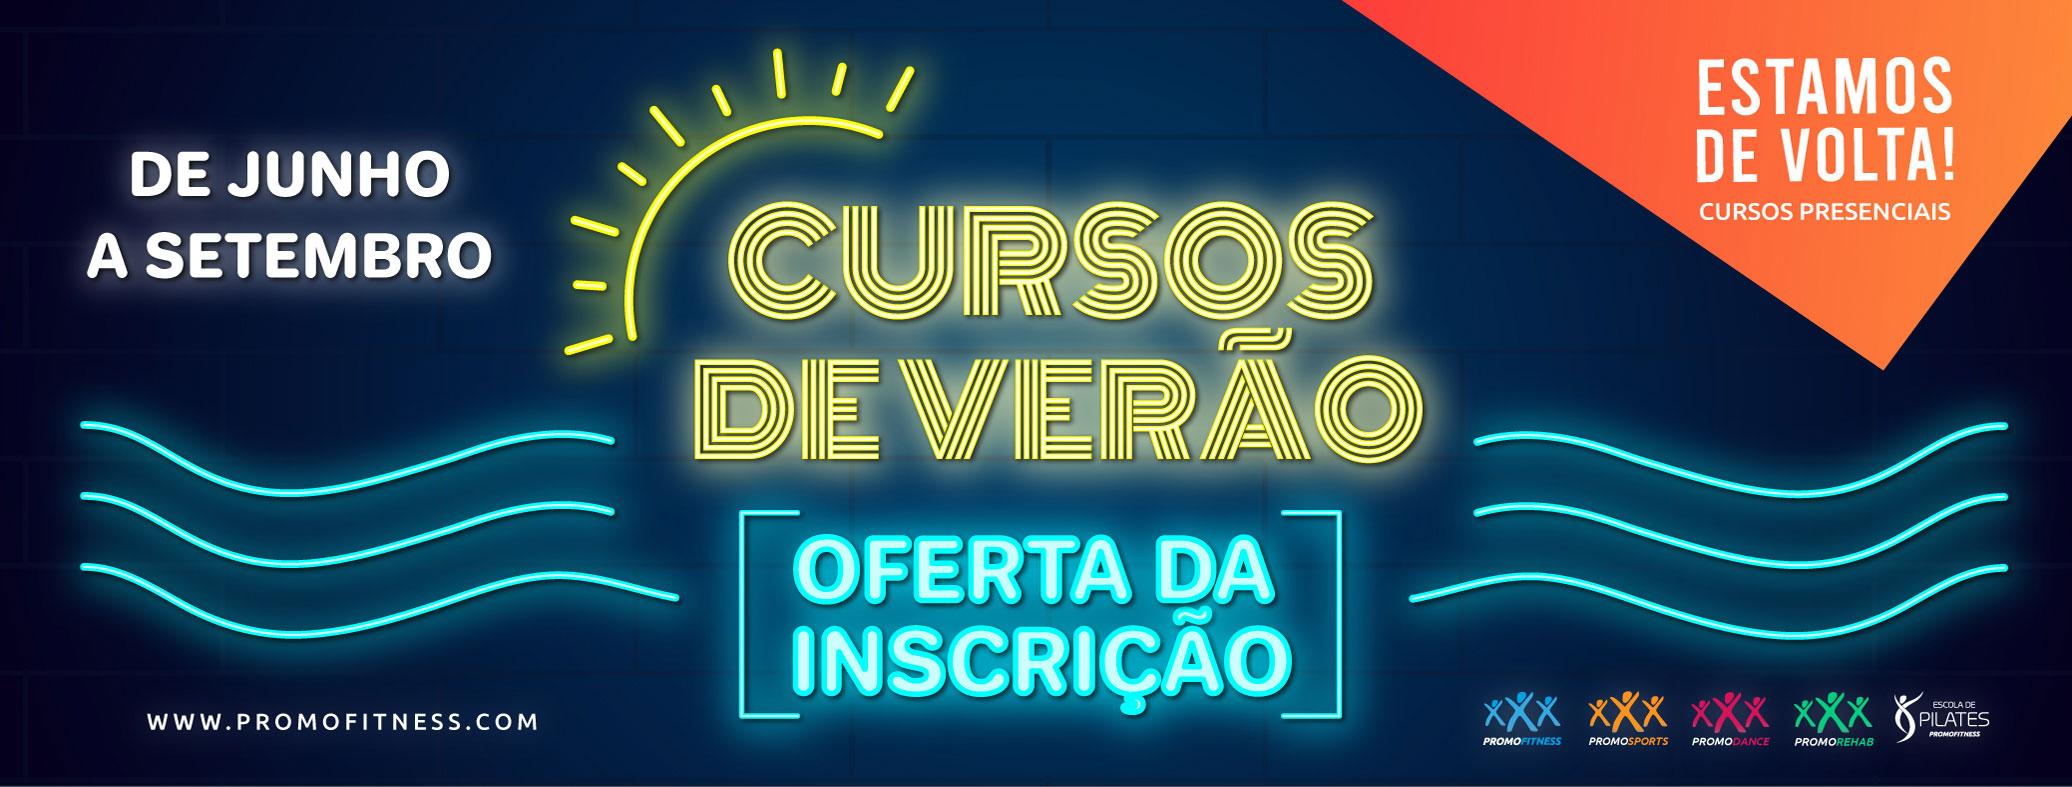 cursosverao_capa_web